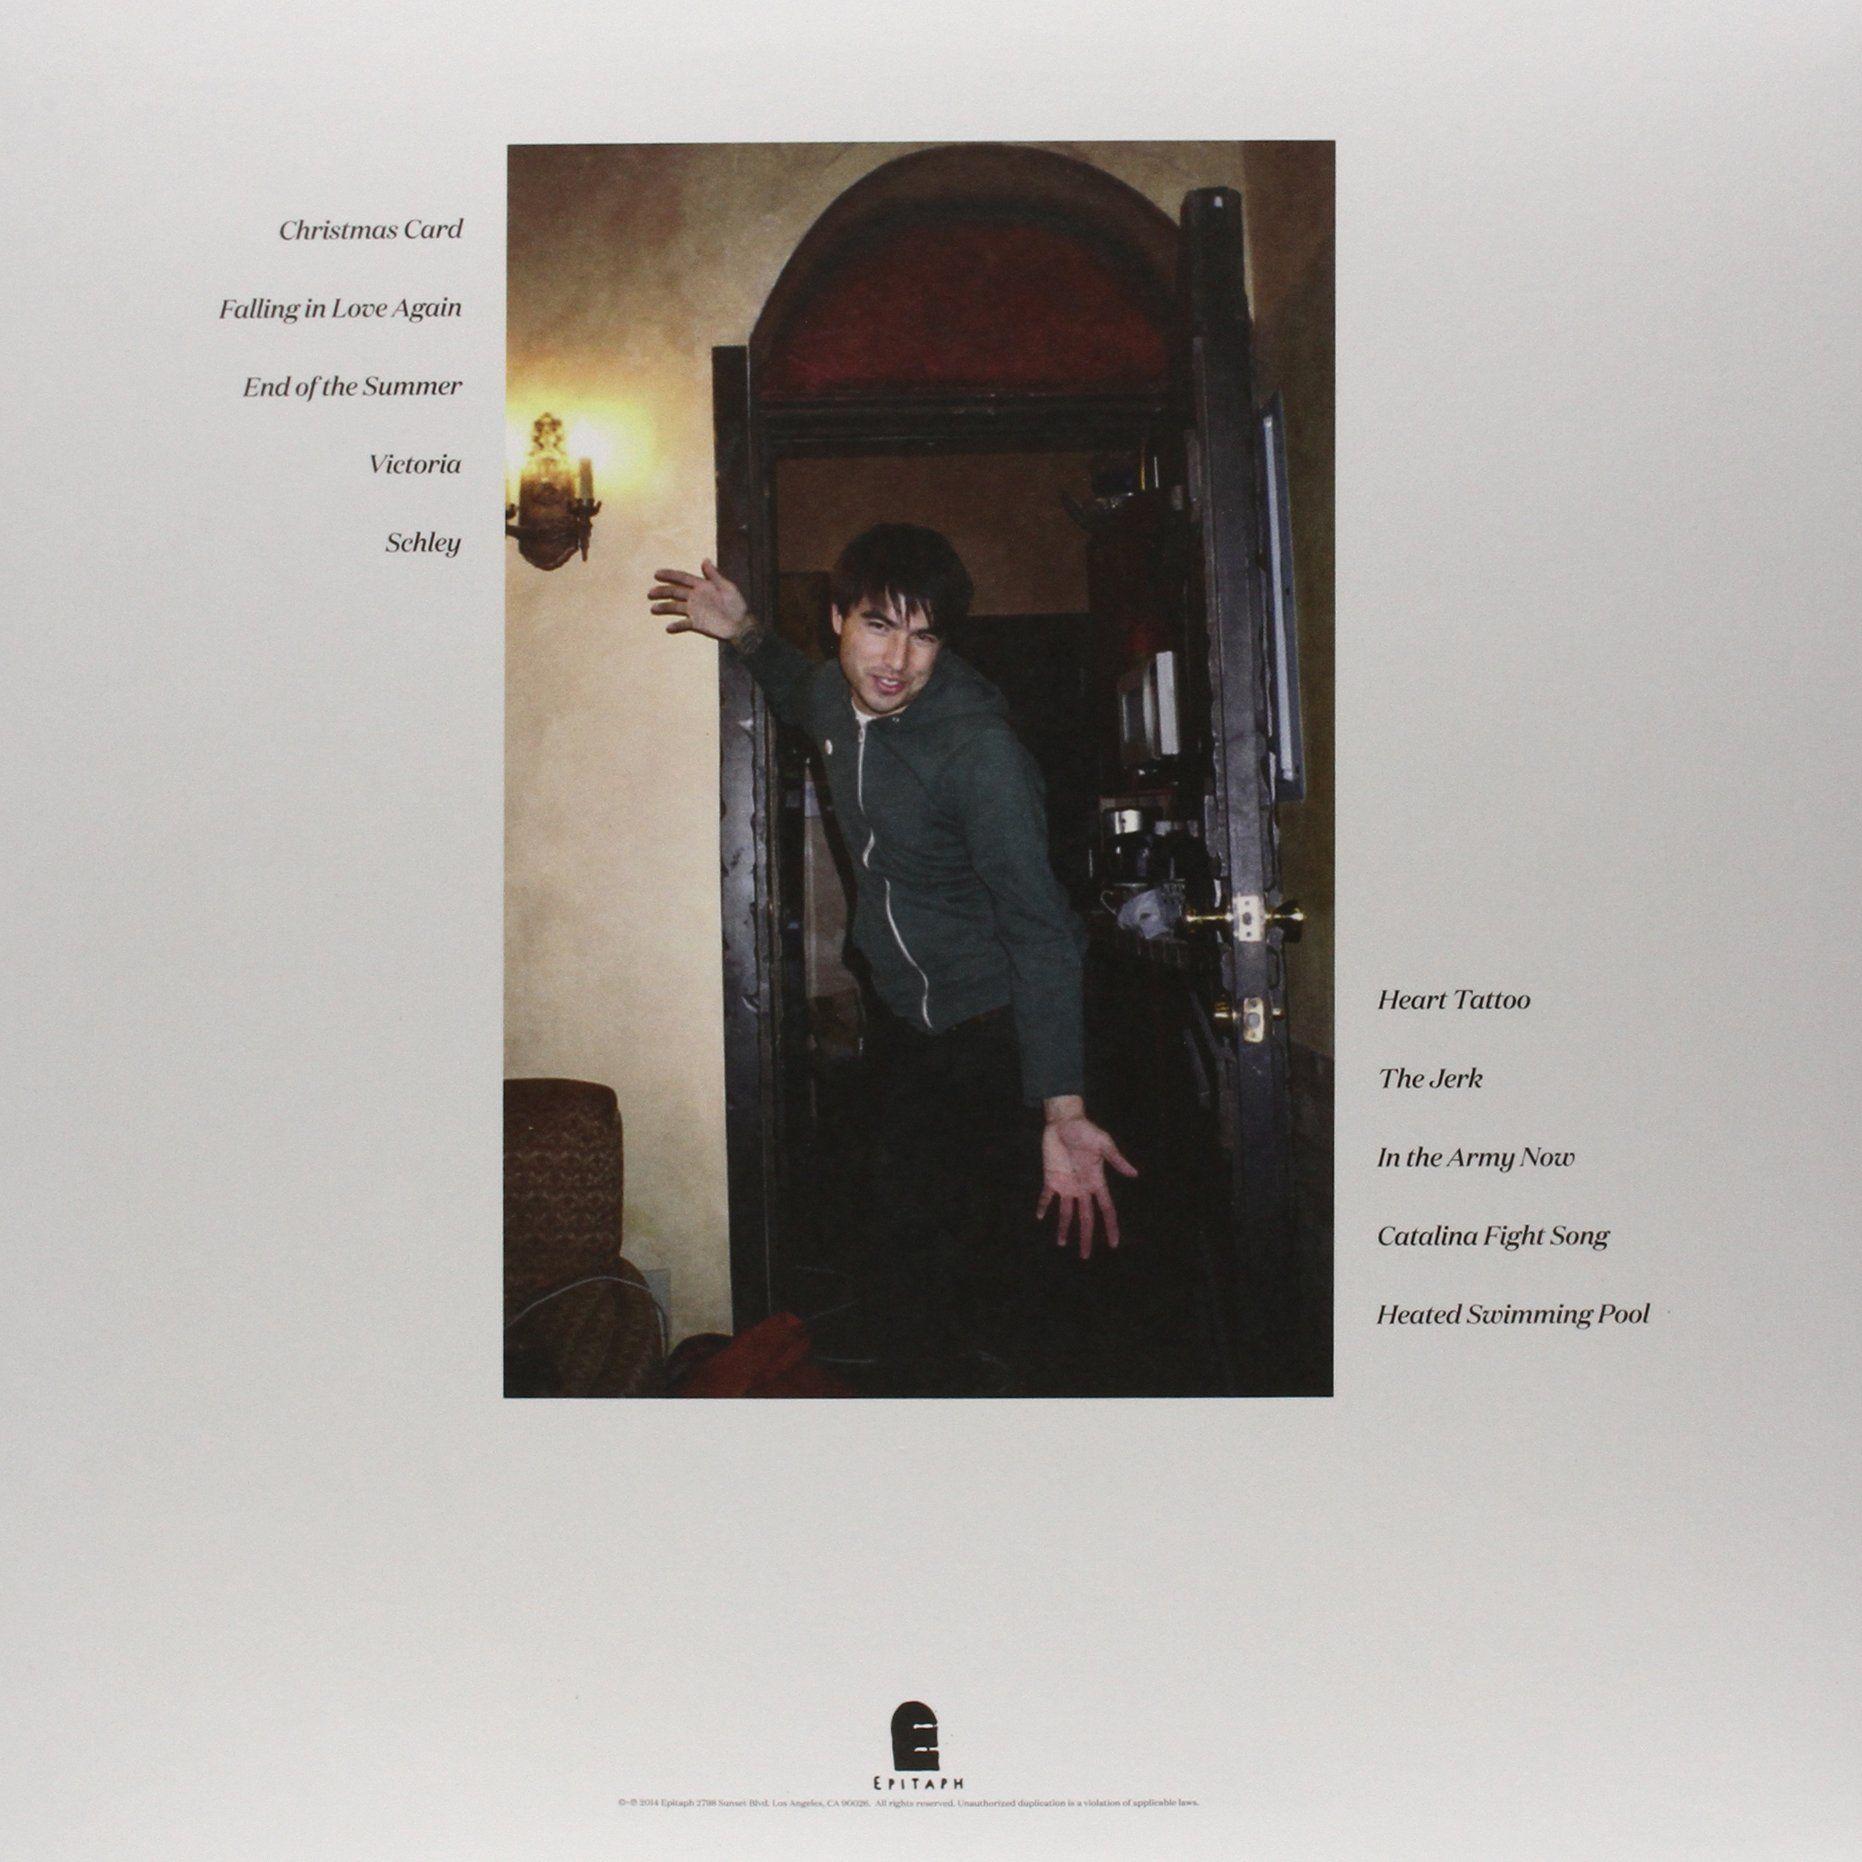 joyce manor christmas card lyrics  elitegiftsonline